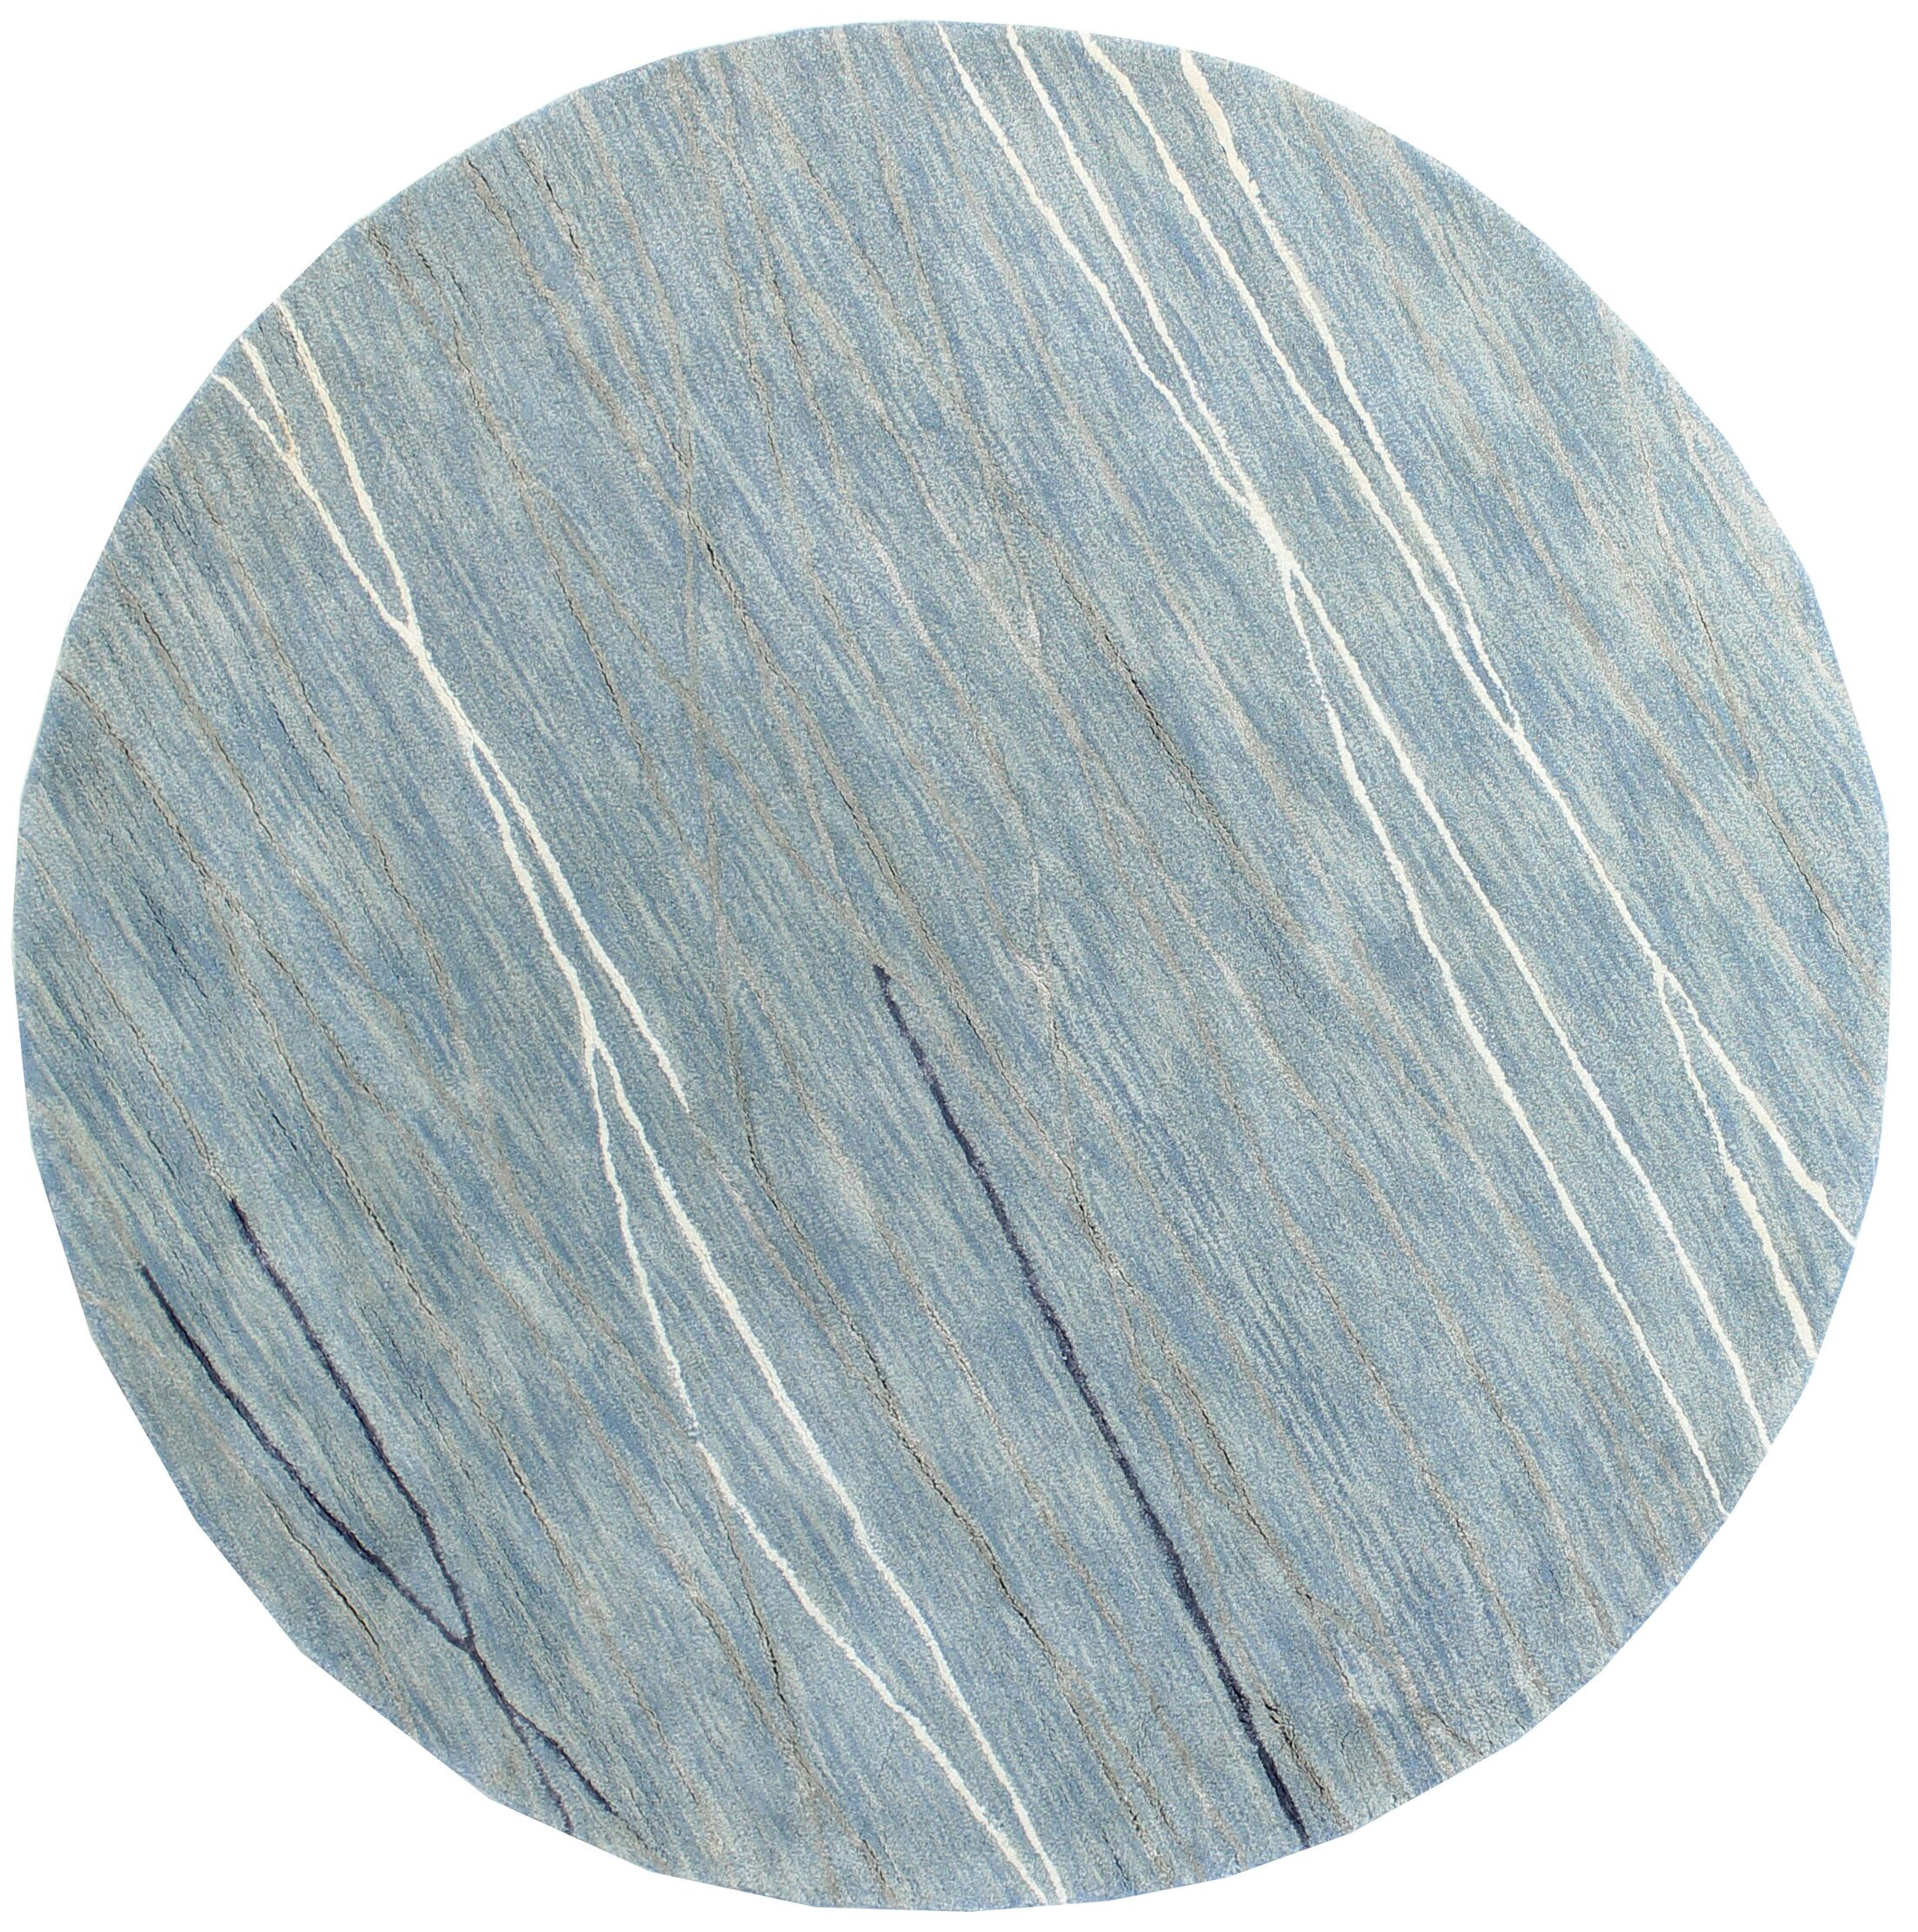 Luczak Hand-Tufted Light Blue Area Rug Rug Size: Round 8'